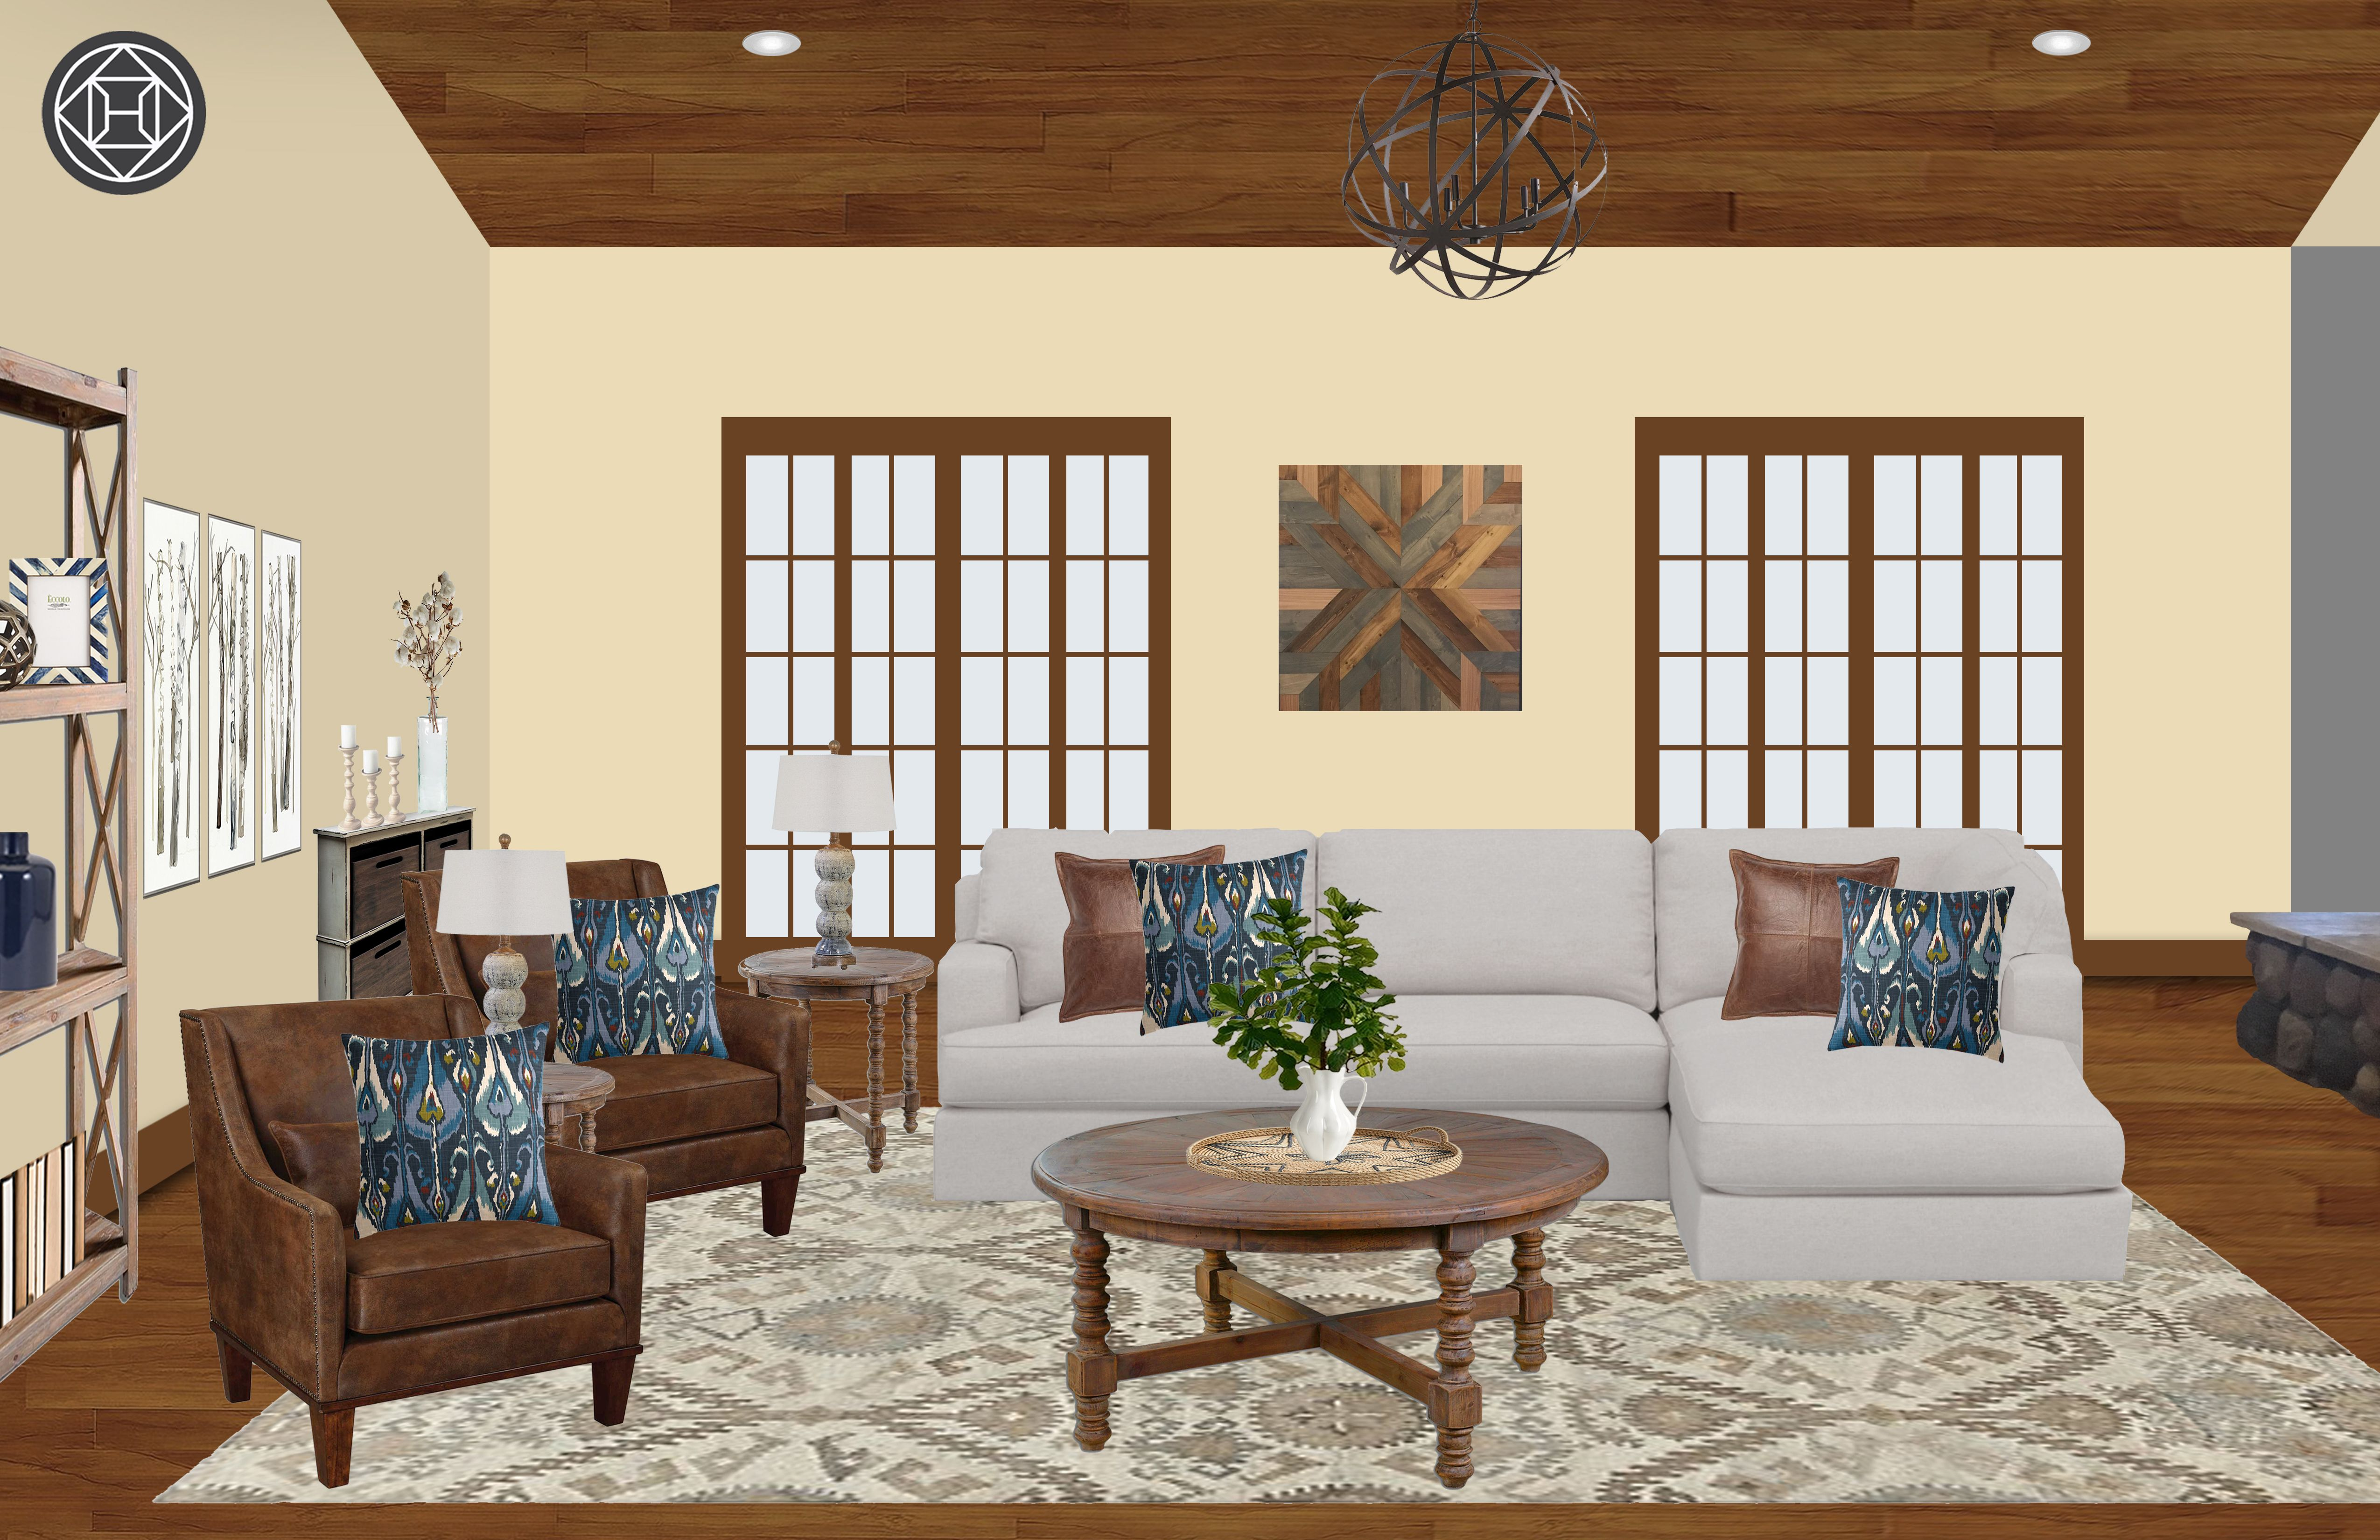 Farmhouse Rustic Living Room Design By Havenly Interior Designer